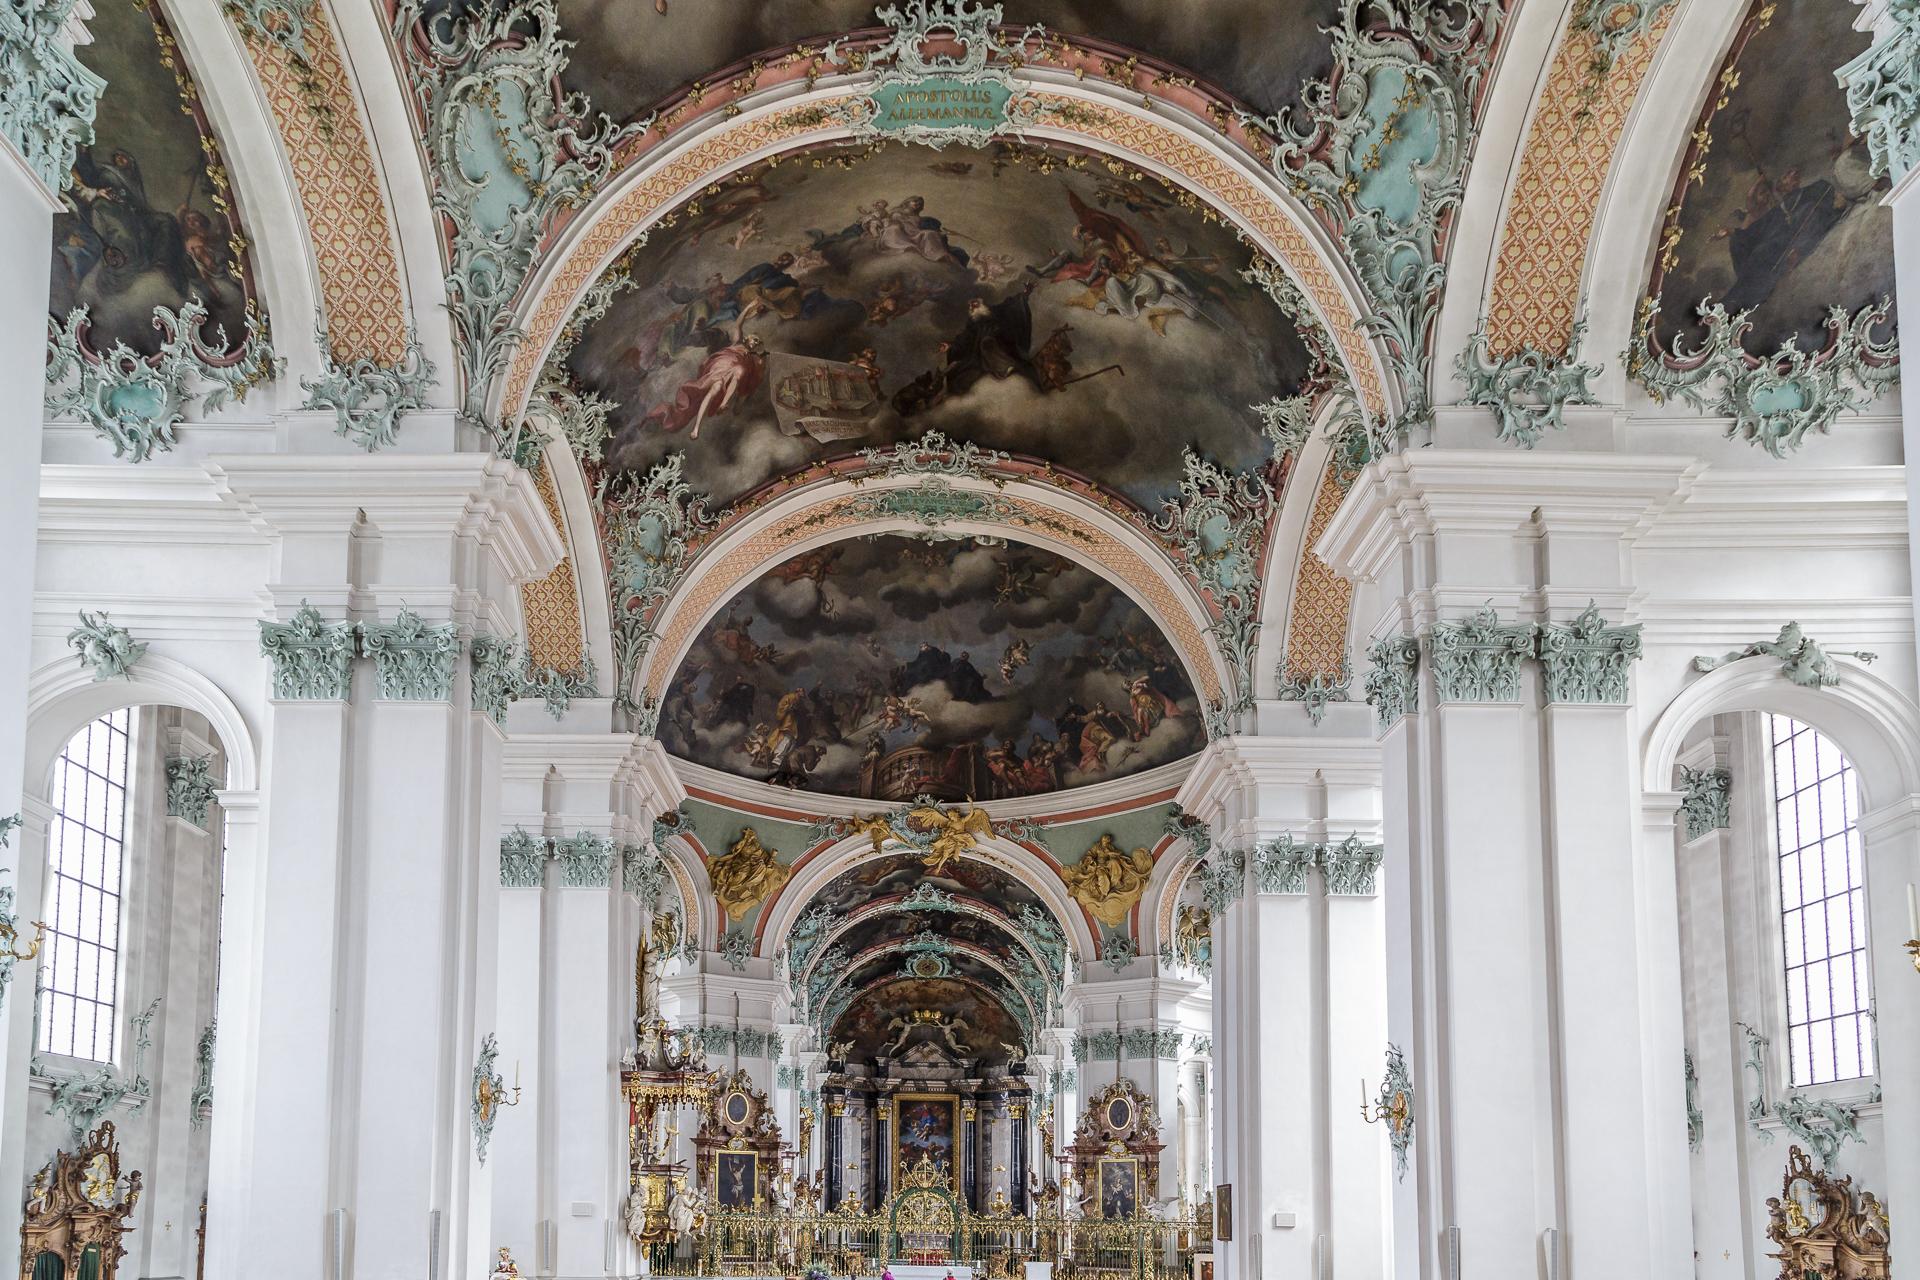 Stiftskirche-St-Gallen-2